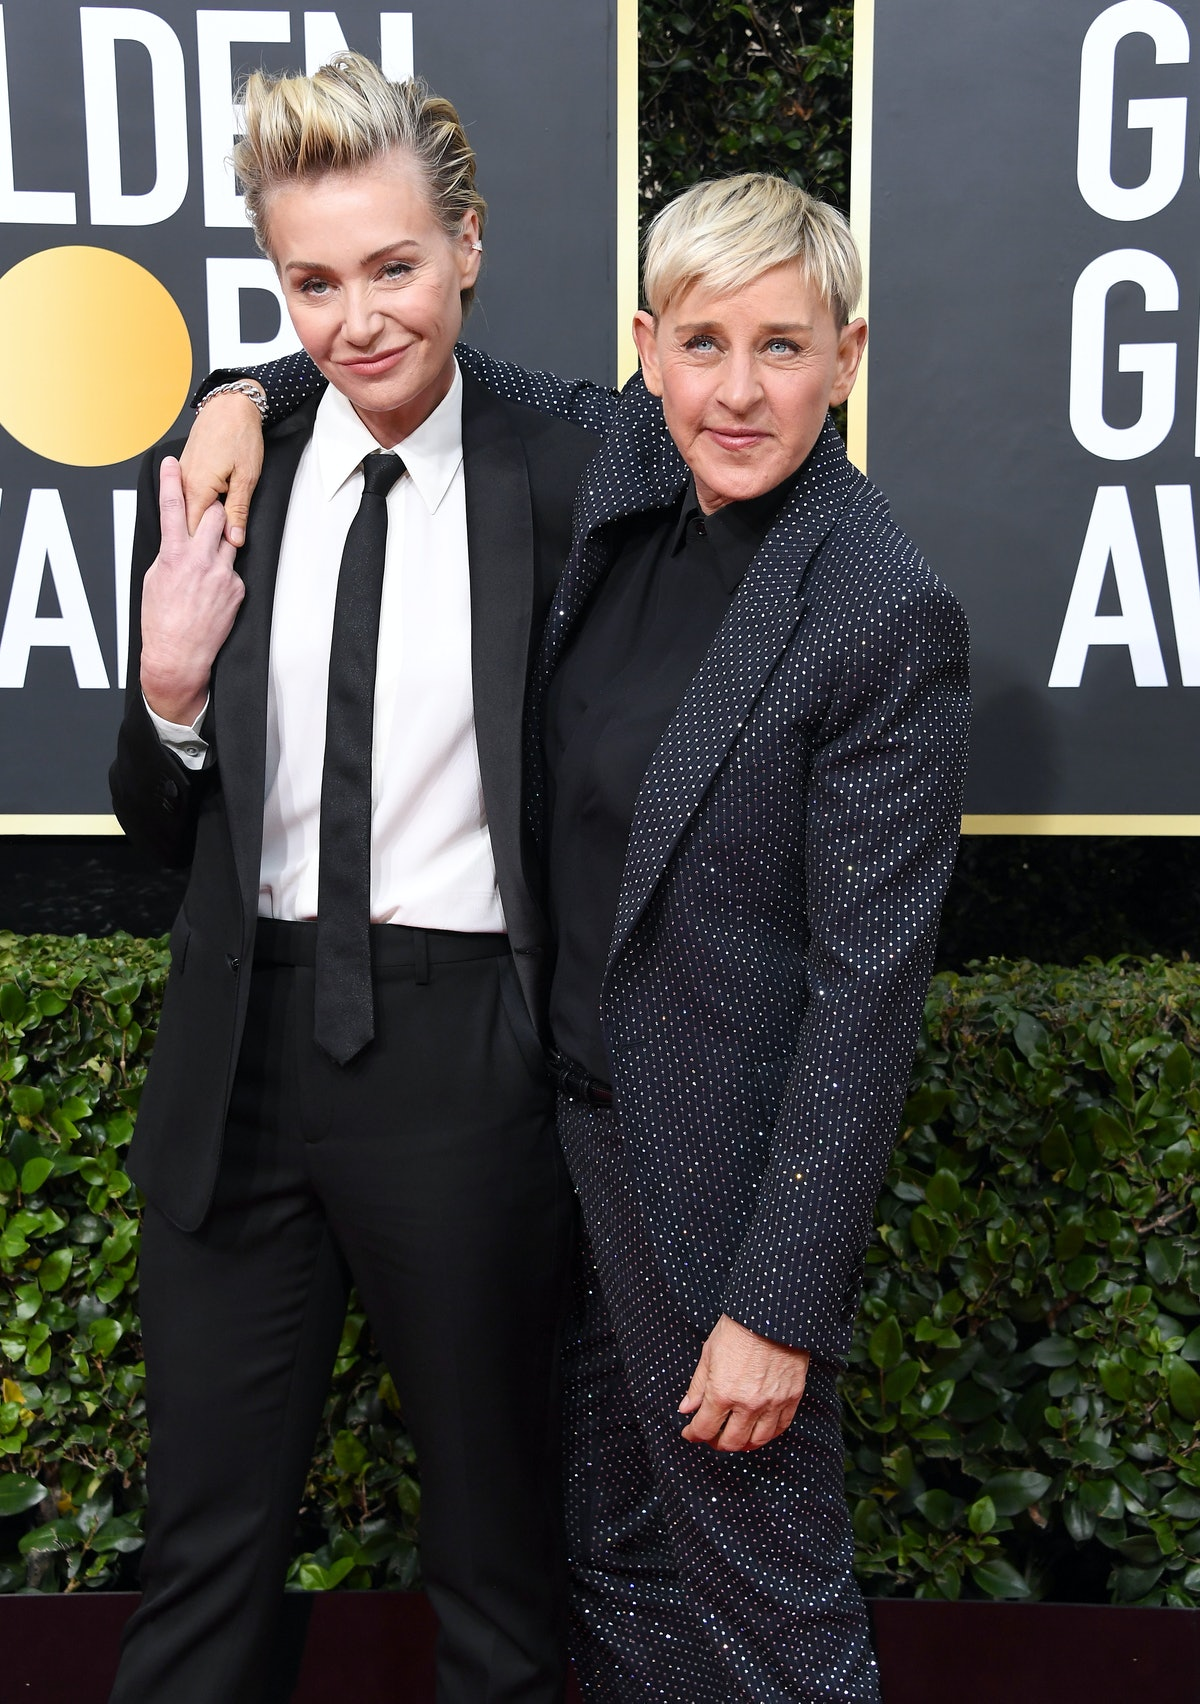 BEVERLY HILLS, CALIFORNIA - JANUARY 05: Portia de Rossi and Ellen DeGeneres  arrives at the 77th Ann...